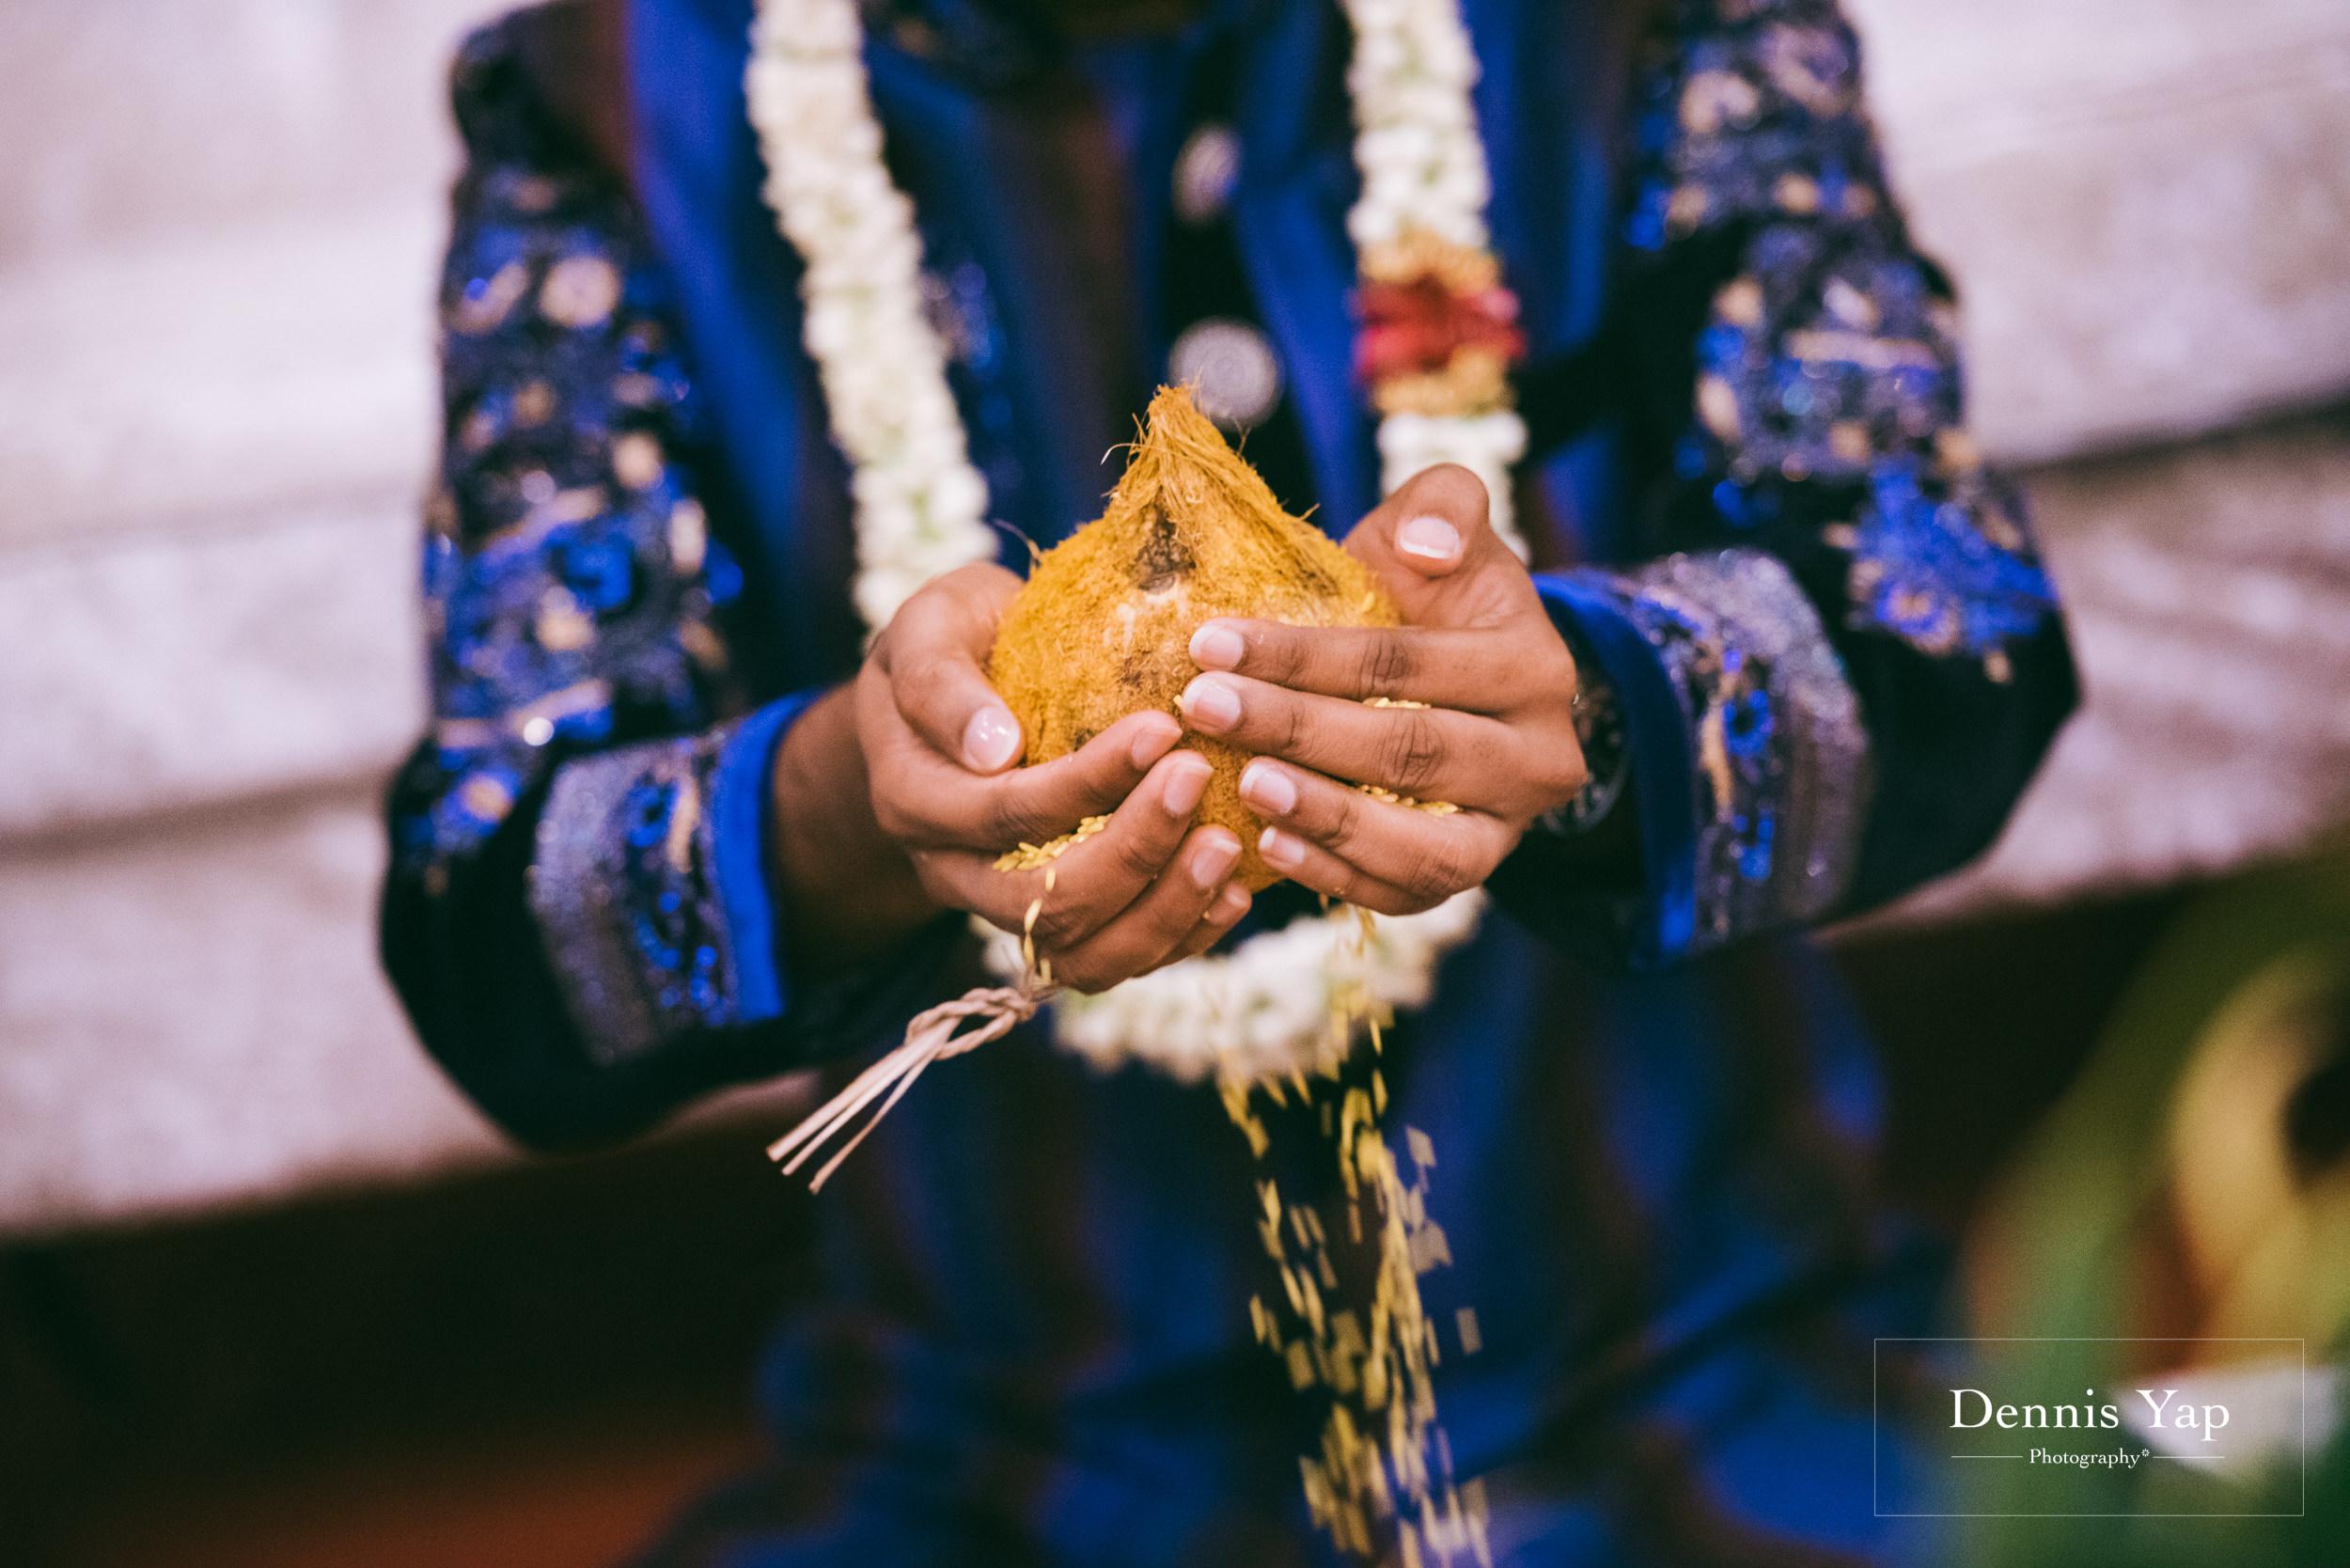 puvaneswaran cangitaa indian wedding ceremony ideal convention dennis yap photography malaysia-11.jpg